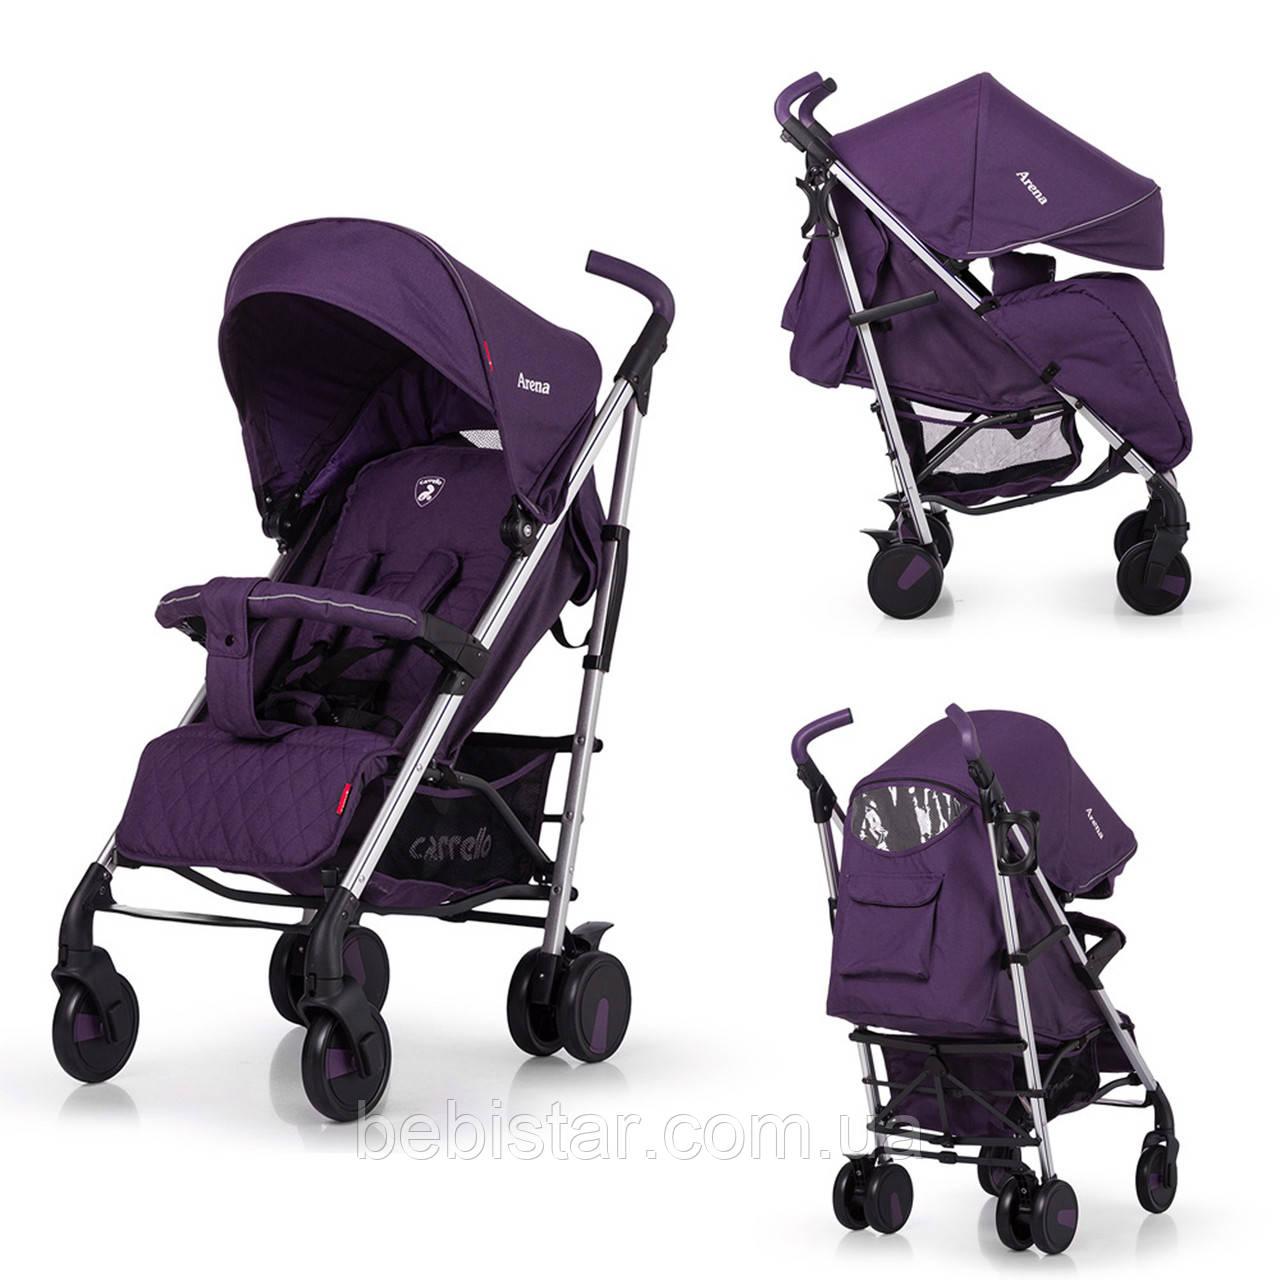 Прогулянкова дитяча коляска-тростина CARRELLO Arena CRL-8504 Ultra Violet в льоні